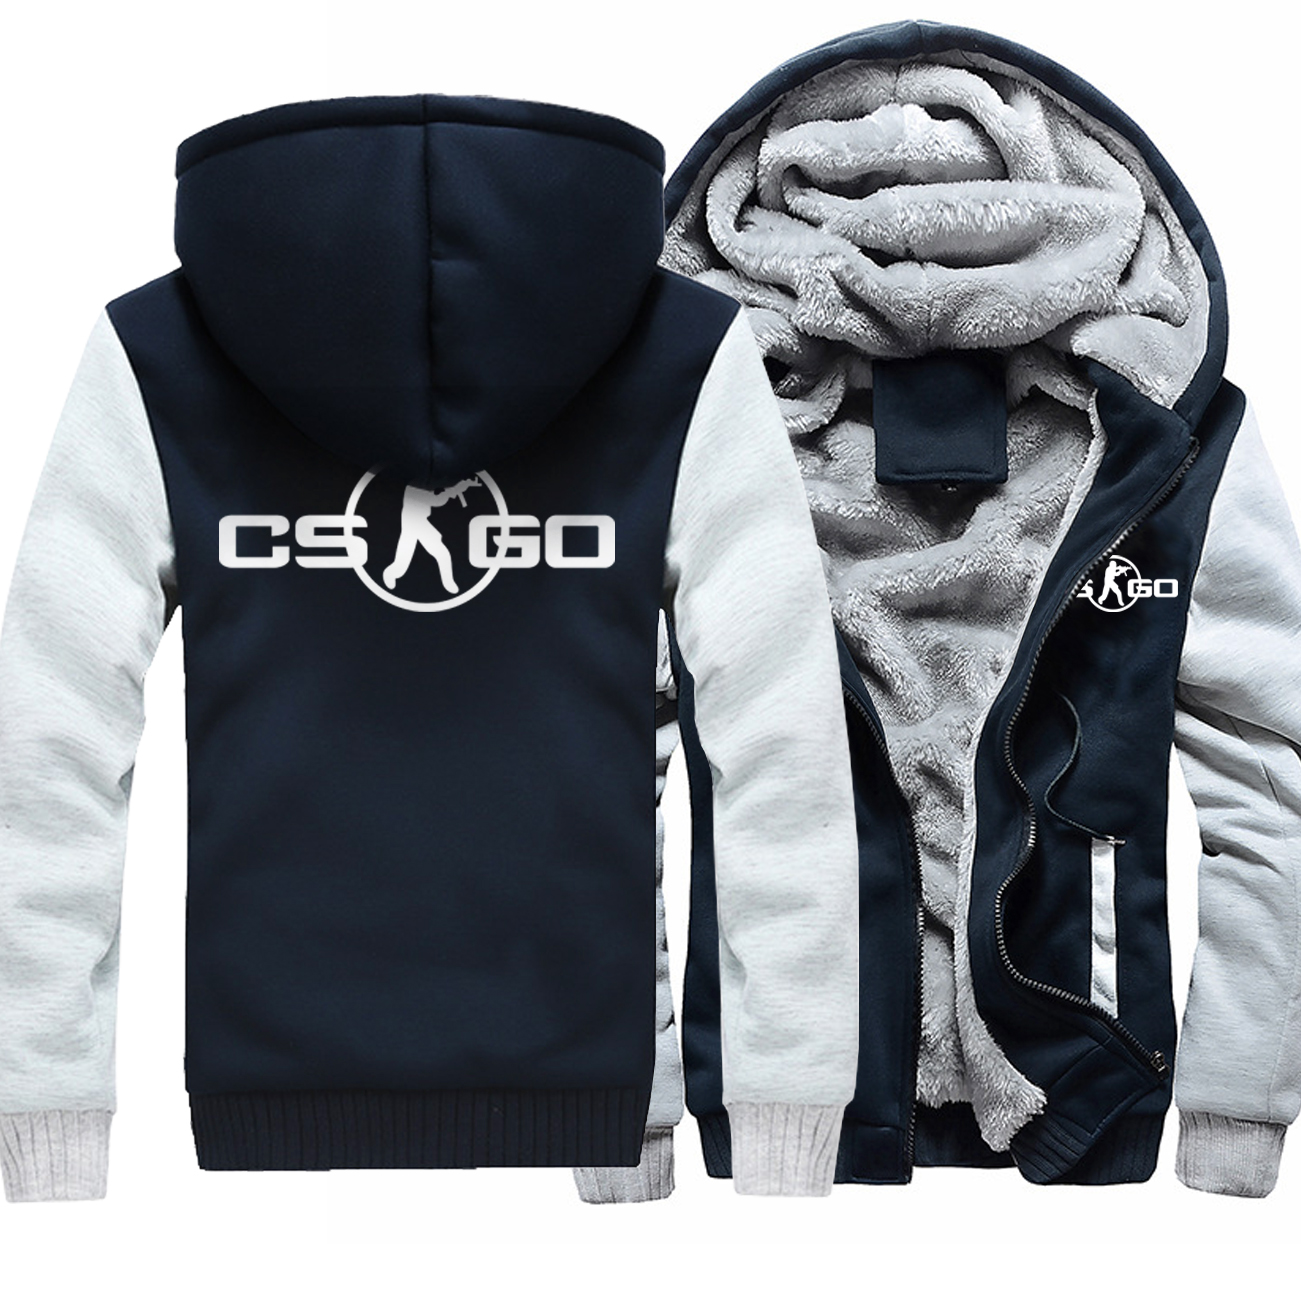 2018 High quality Thick Zipper Sweatshirts Hipster Print CS GO Winter Jacket For Men Hoody Costume Hoodies Men Hip Hop Harajuku